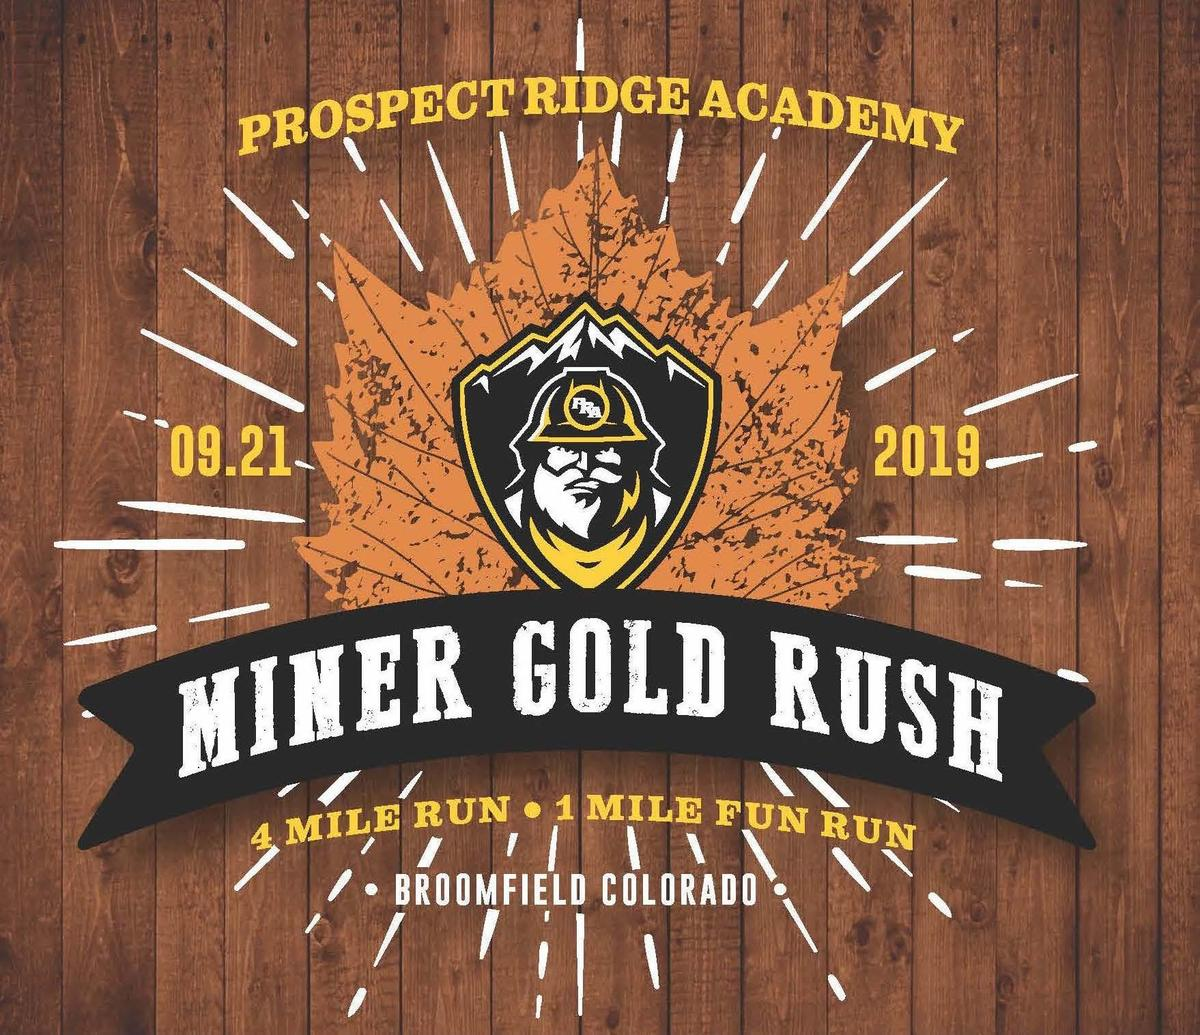 Miner Gold Rush 2019